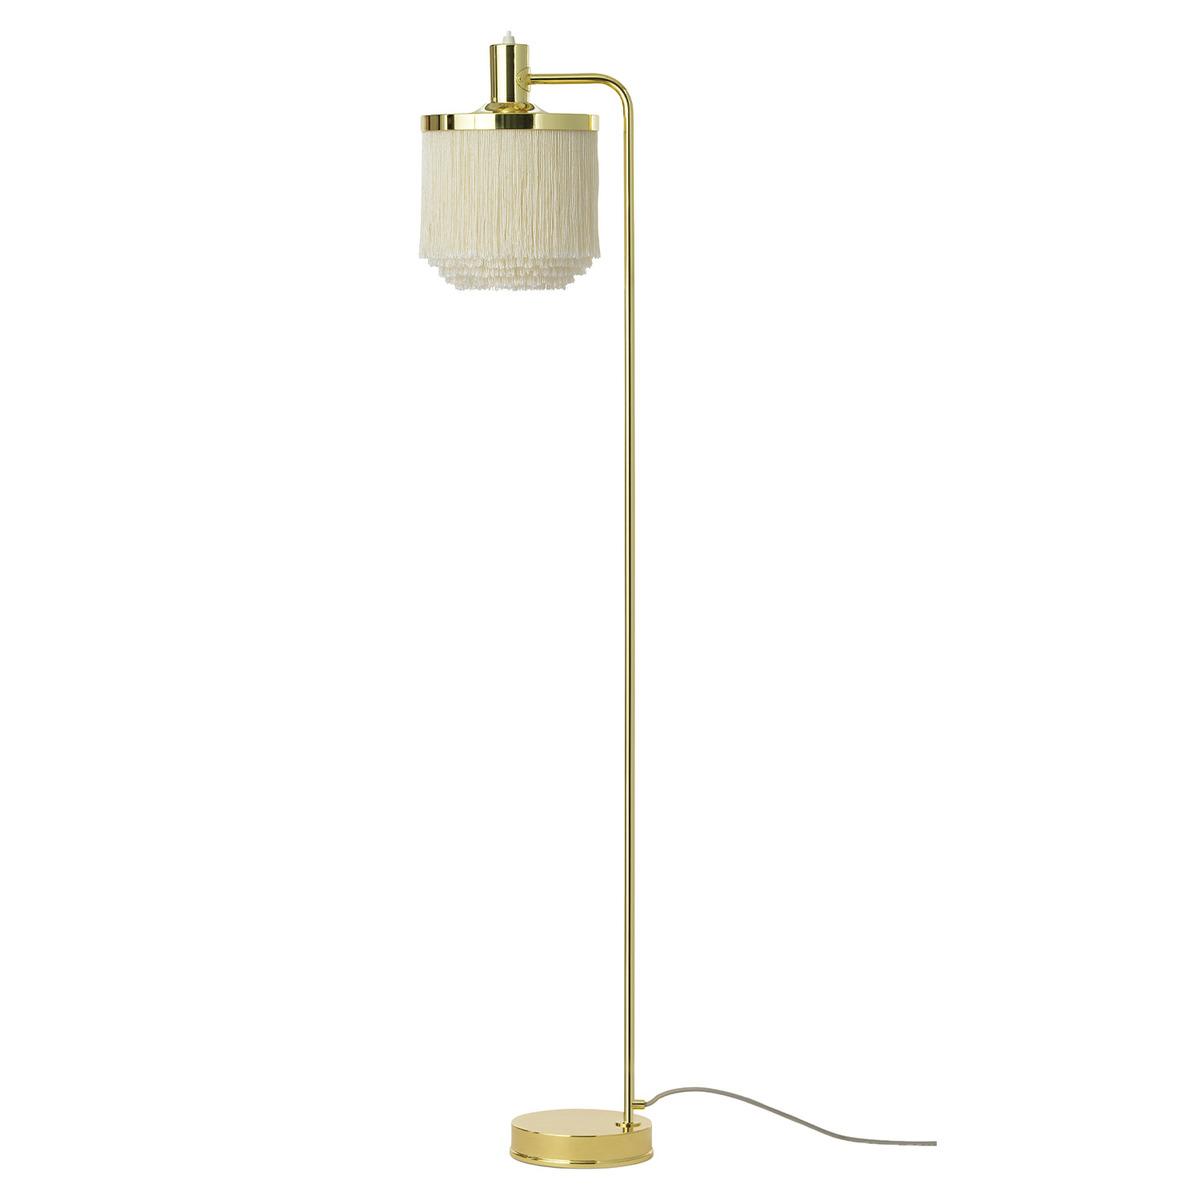 Warm Nordic Fringe Floor Lamp, Cream White